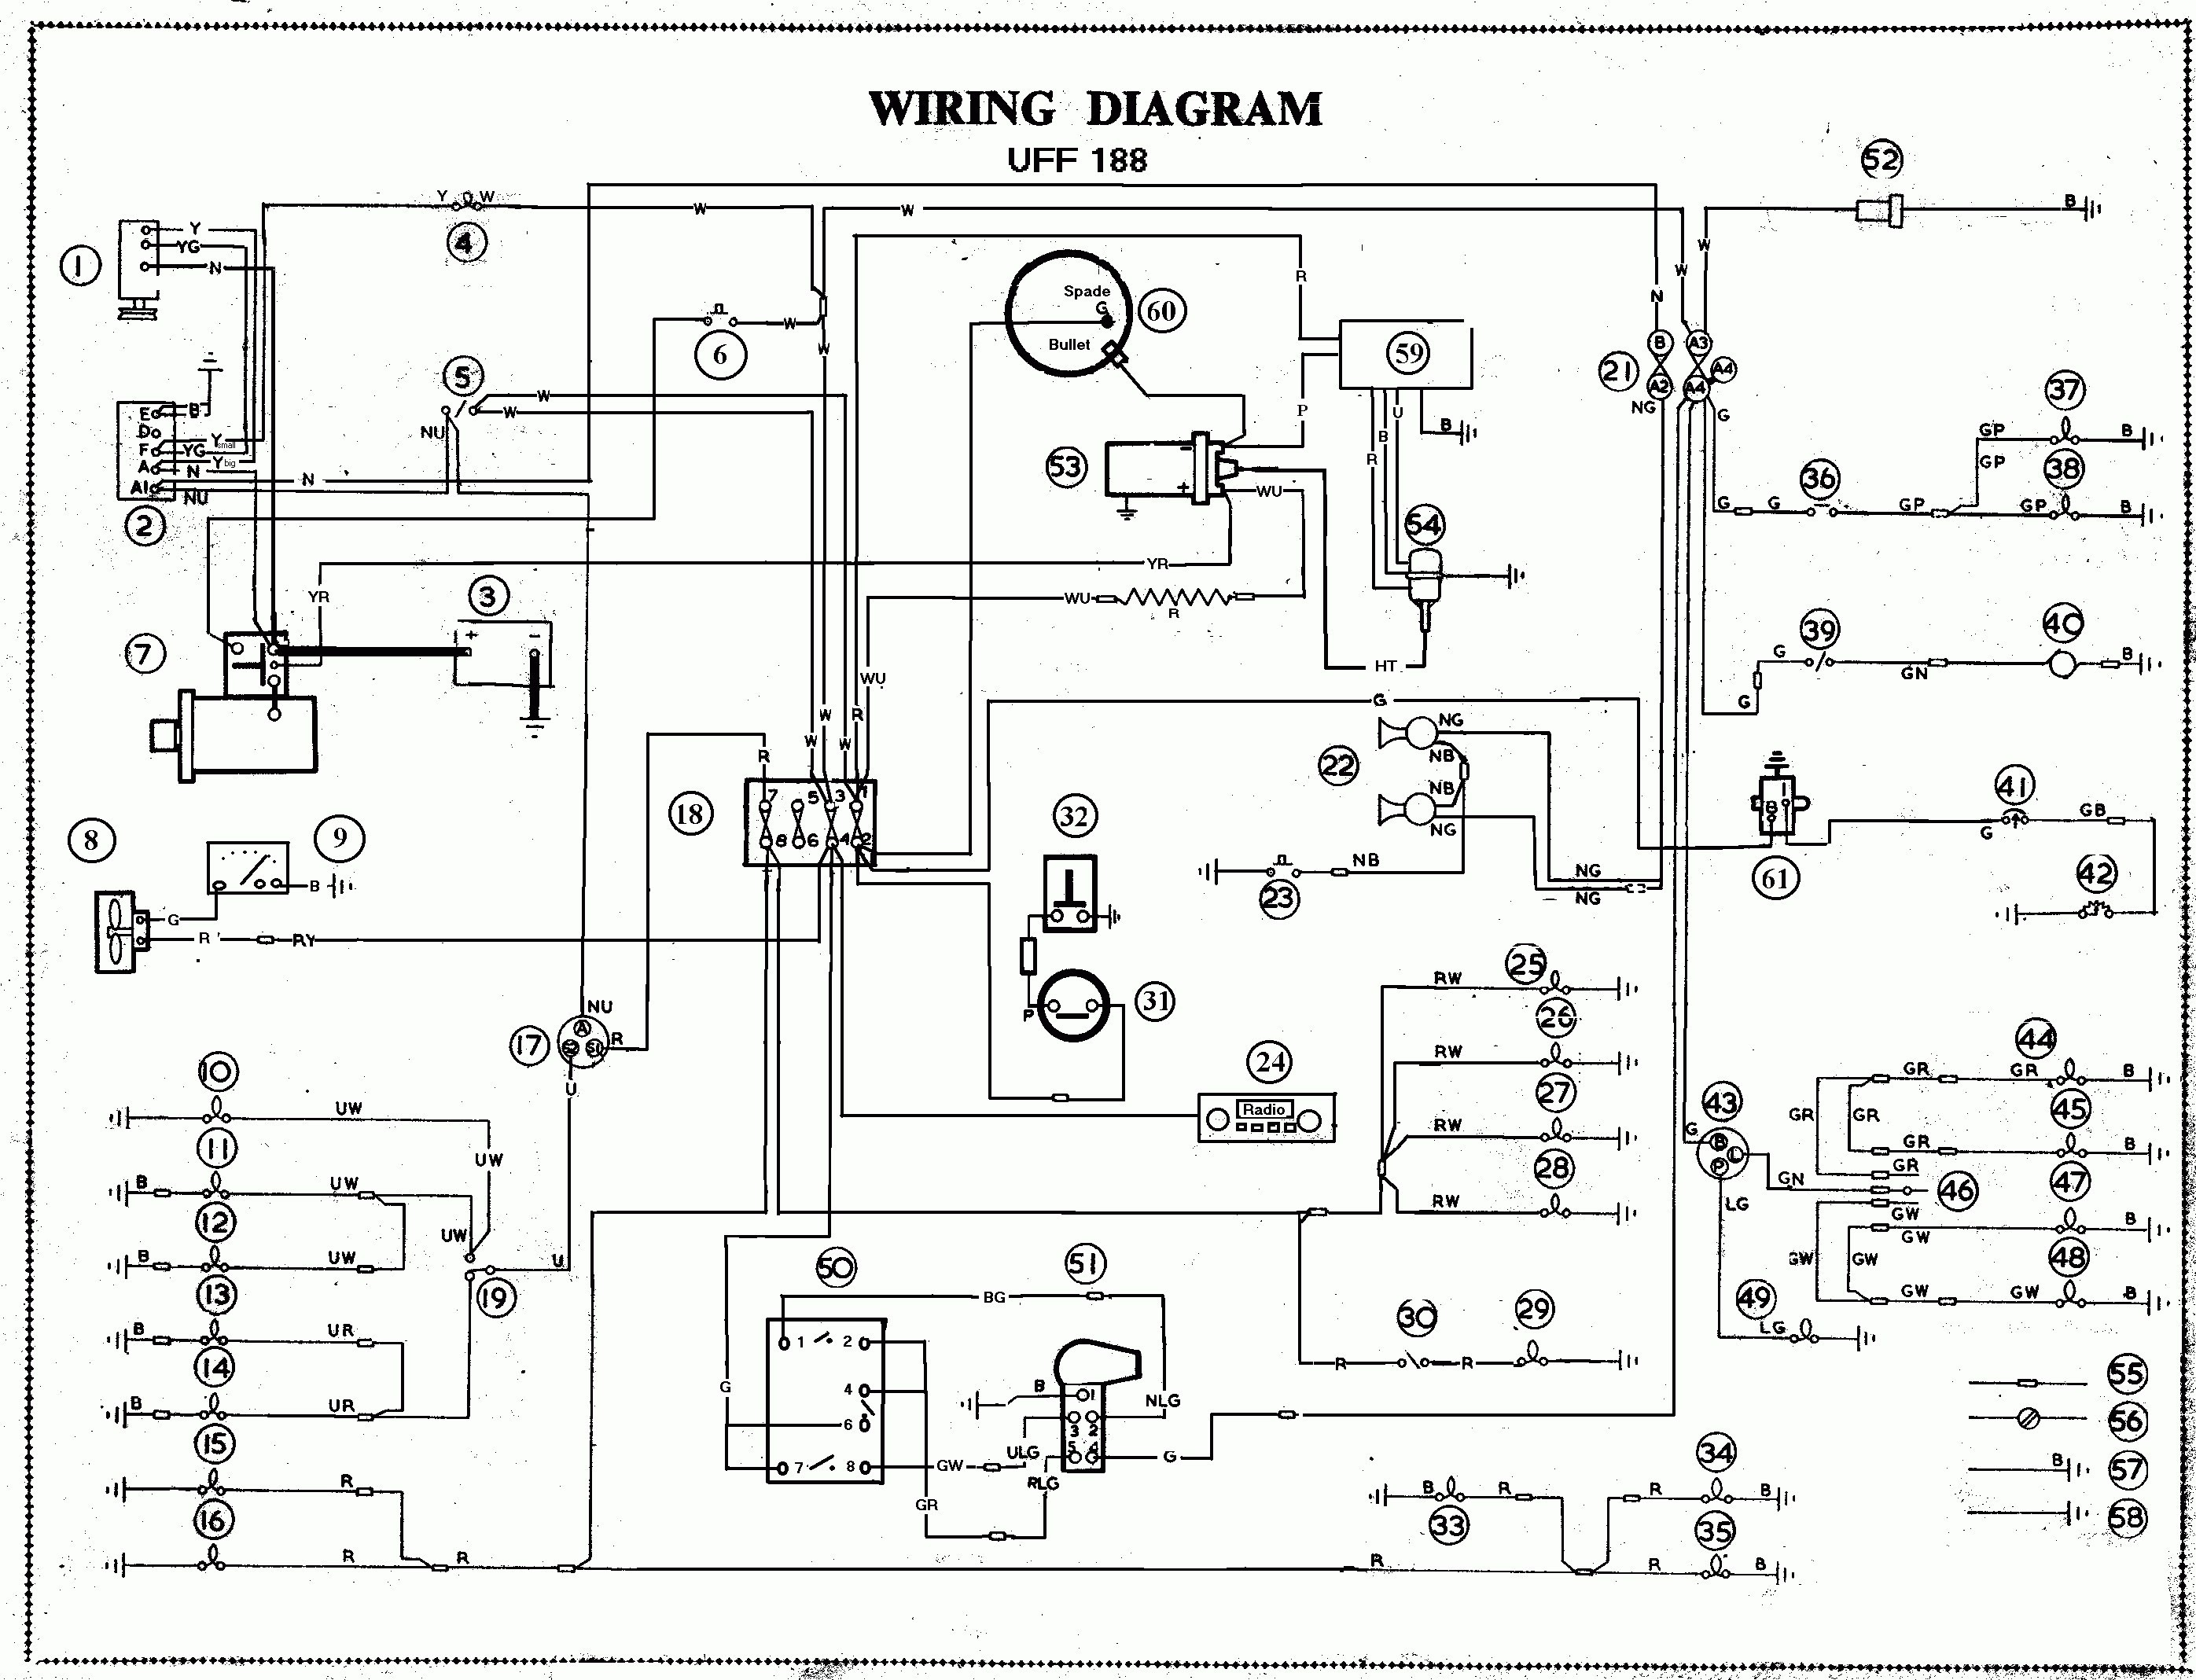 audi a2 wiring diagram tekonsha 1997 a4 engine library symbols free download of